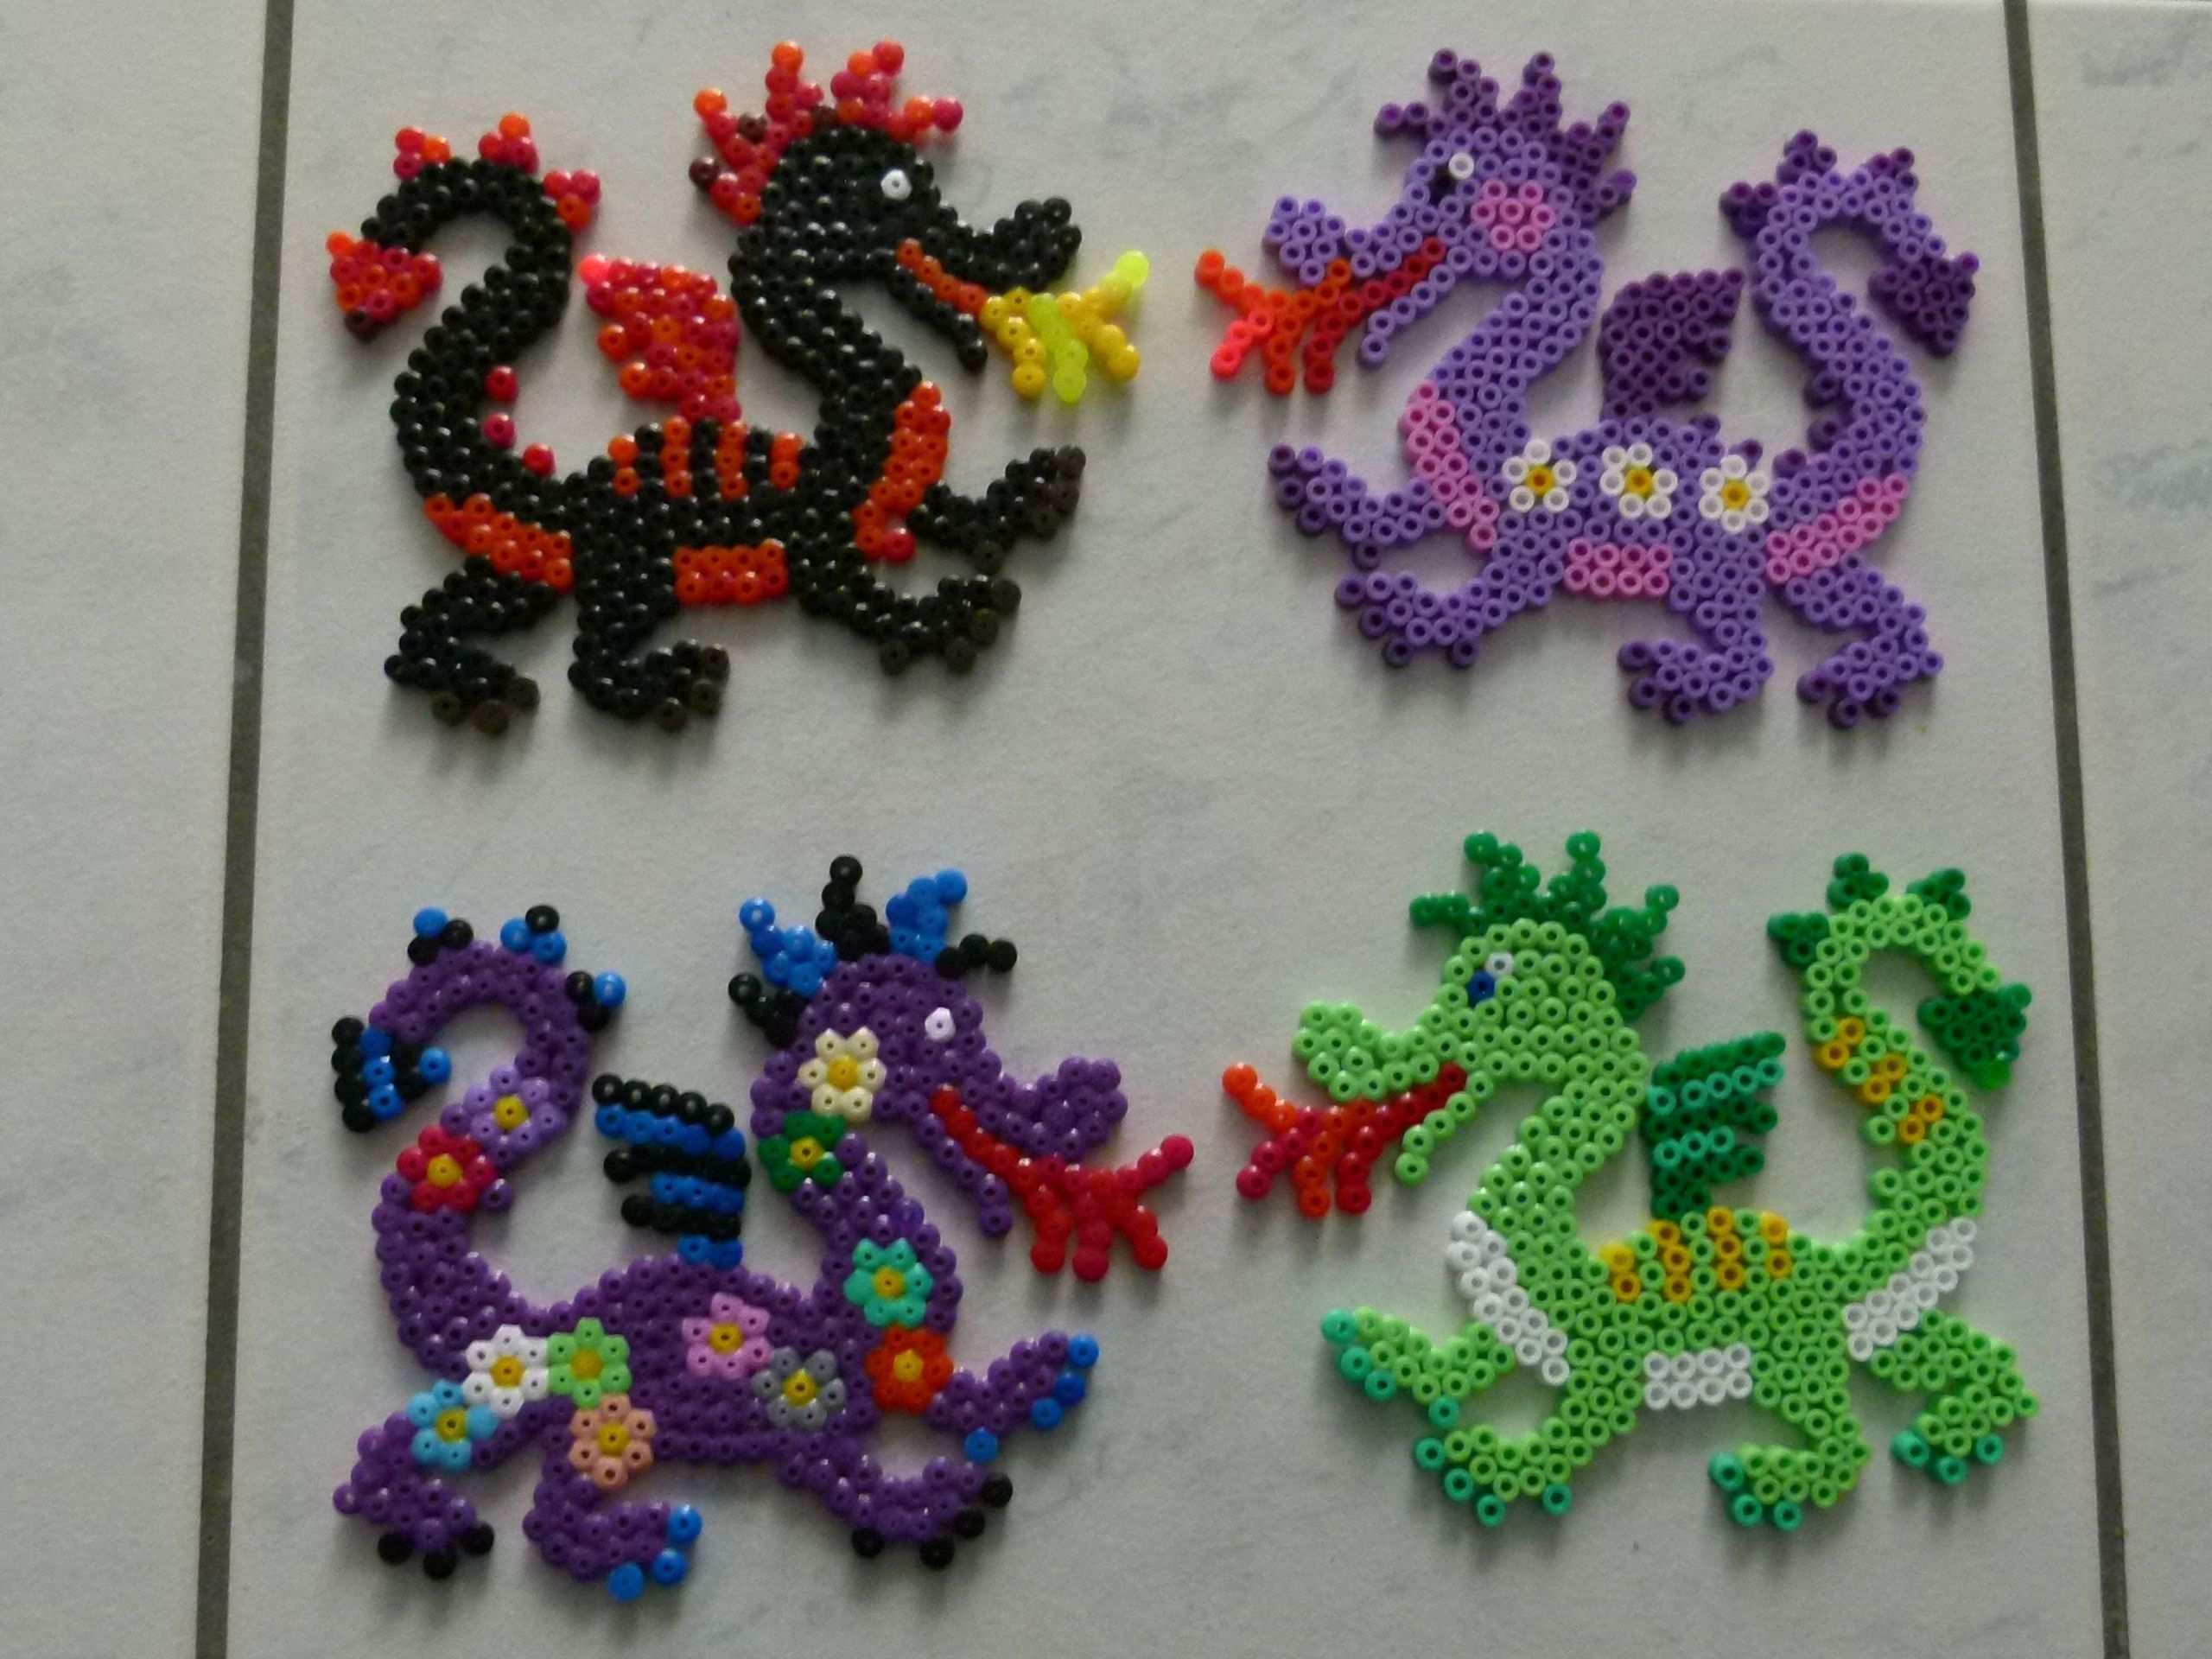 Dragons Hama Beads Bugelperlen By Brandi040 Bugelperlen Basteln Bugelperlen Perler Bead Designs